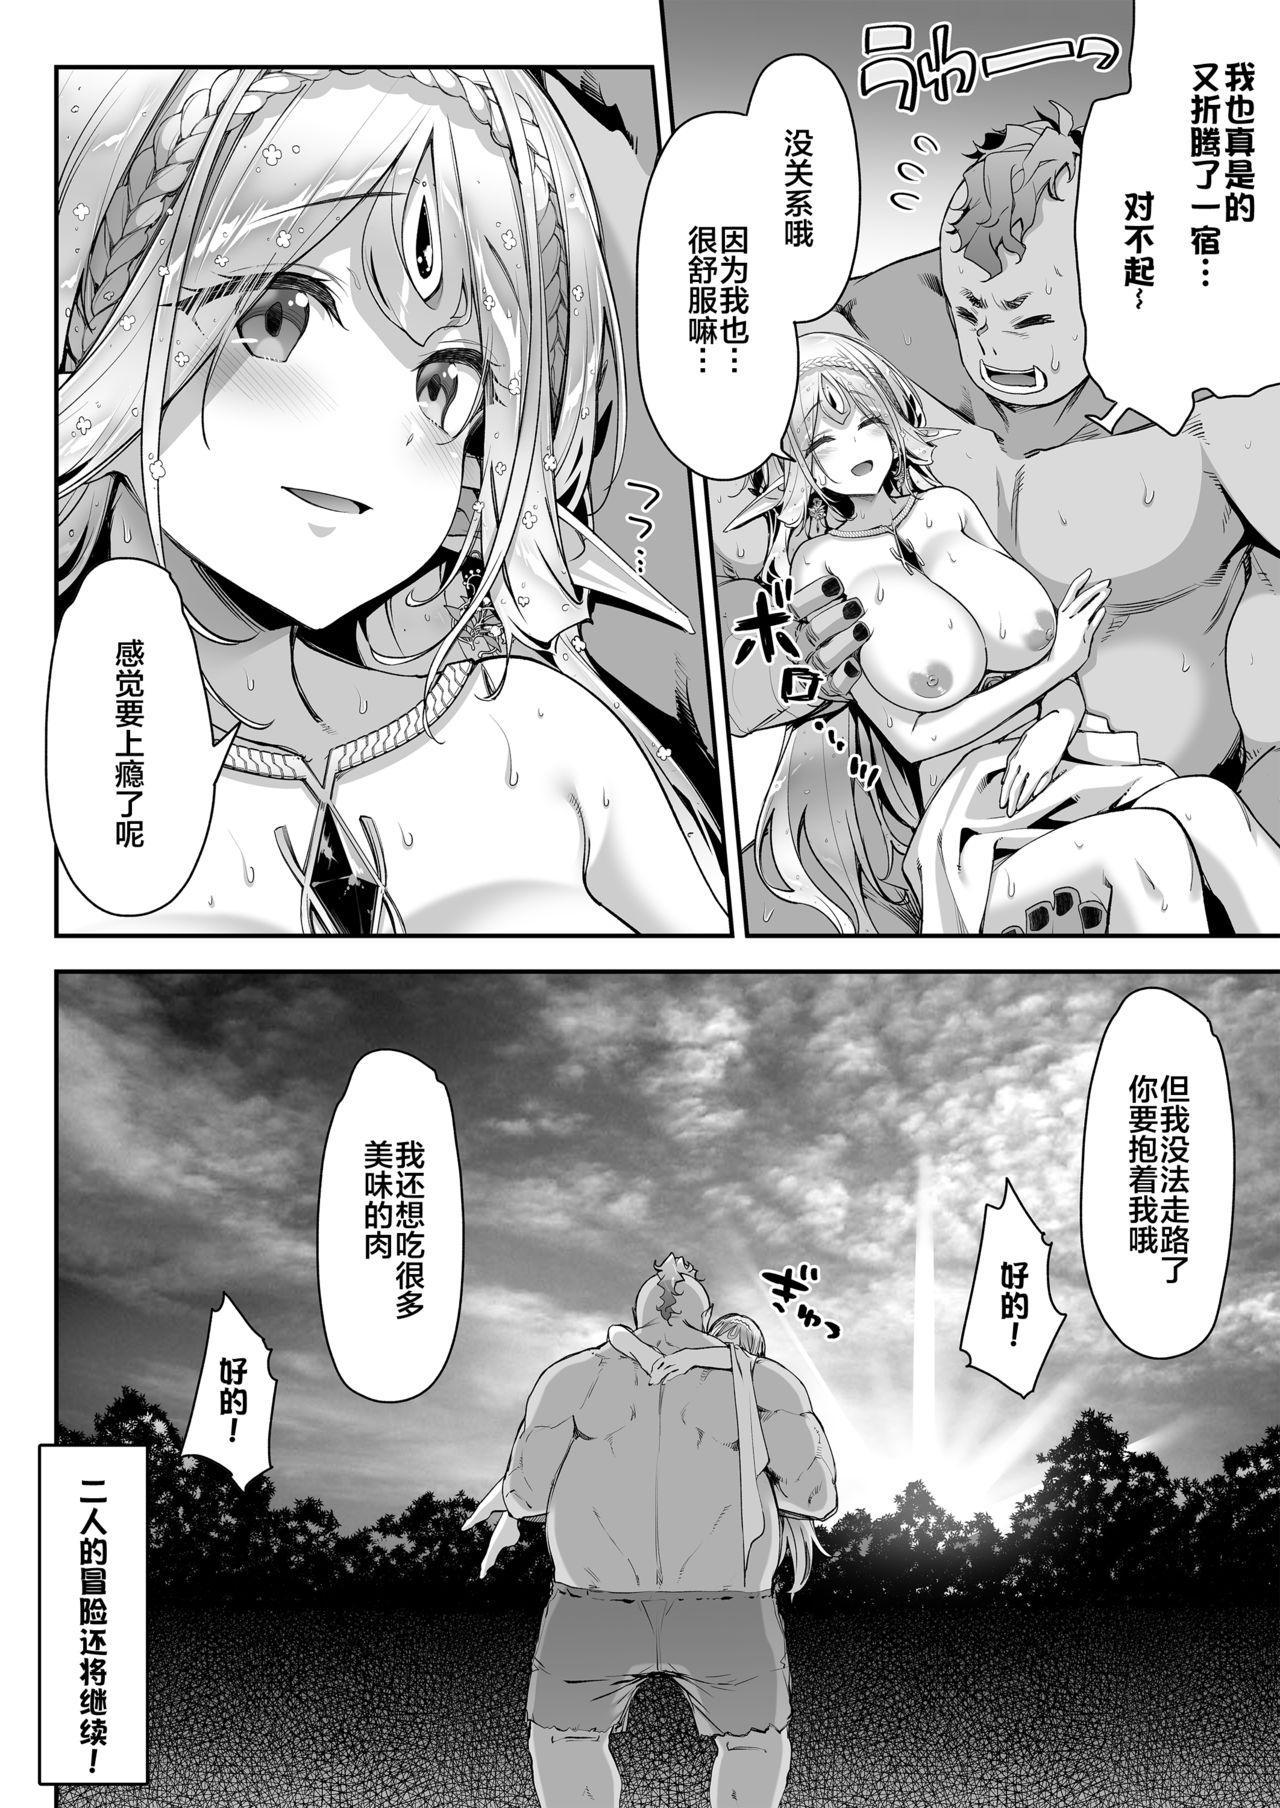 [Ichinose Land] Midara na Elf-san wa Orc-kun ga Osuki [Chinese] [新桥月白日语社] [Digital] 30